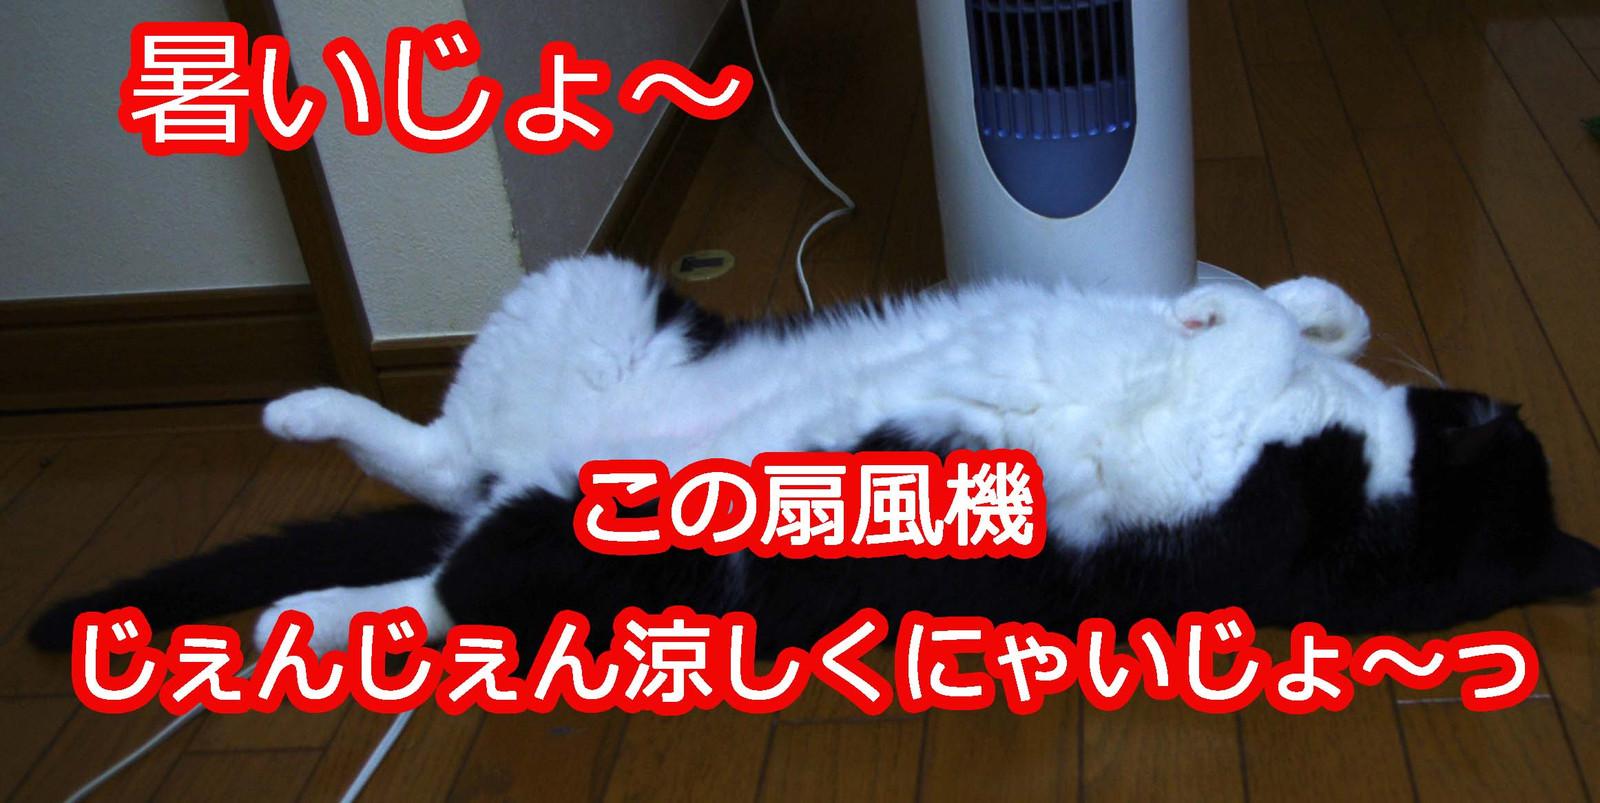 2012_07_27_6537_edited1